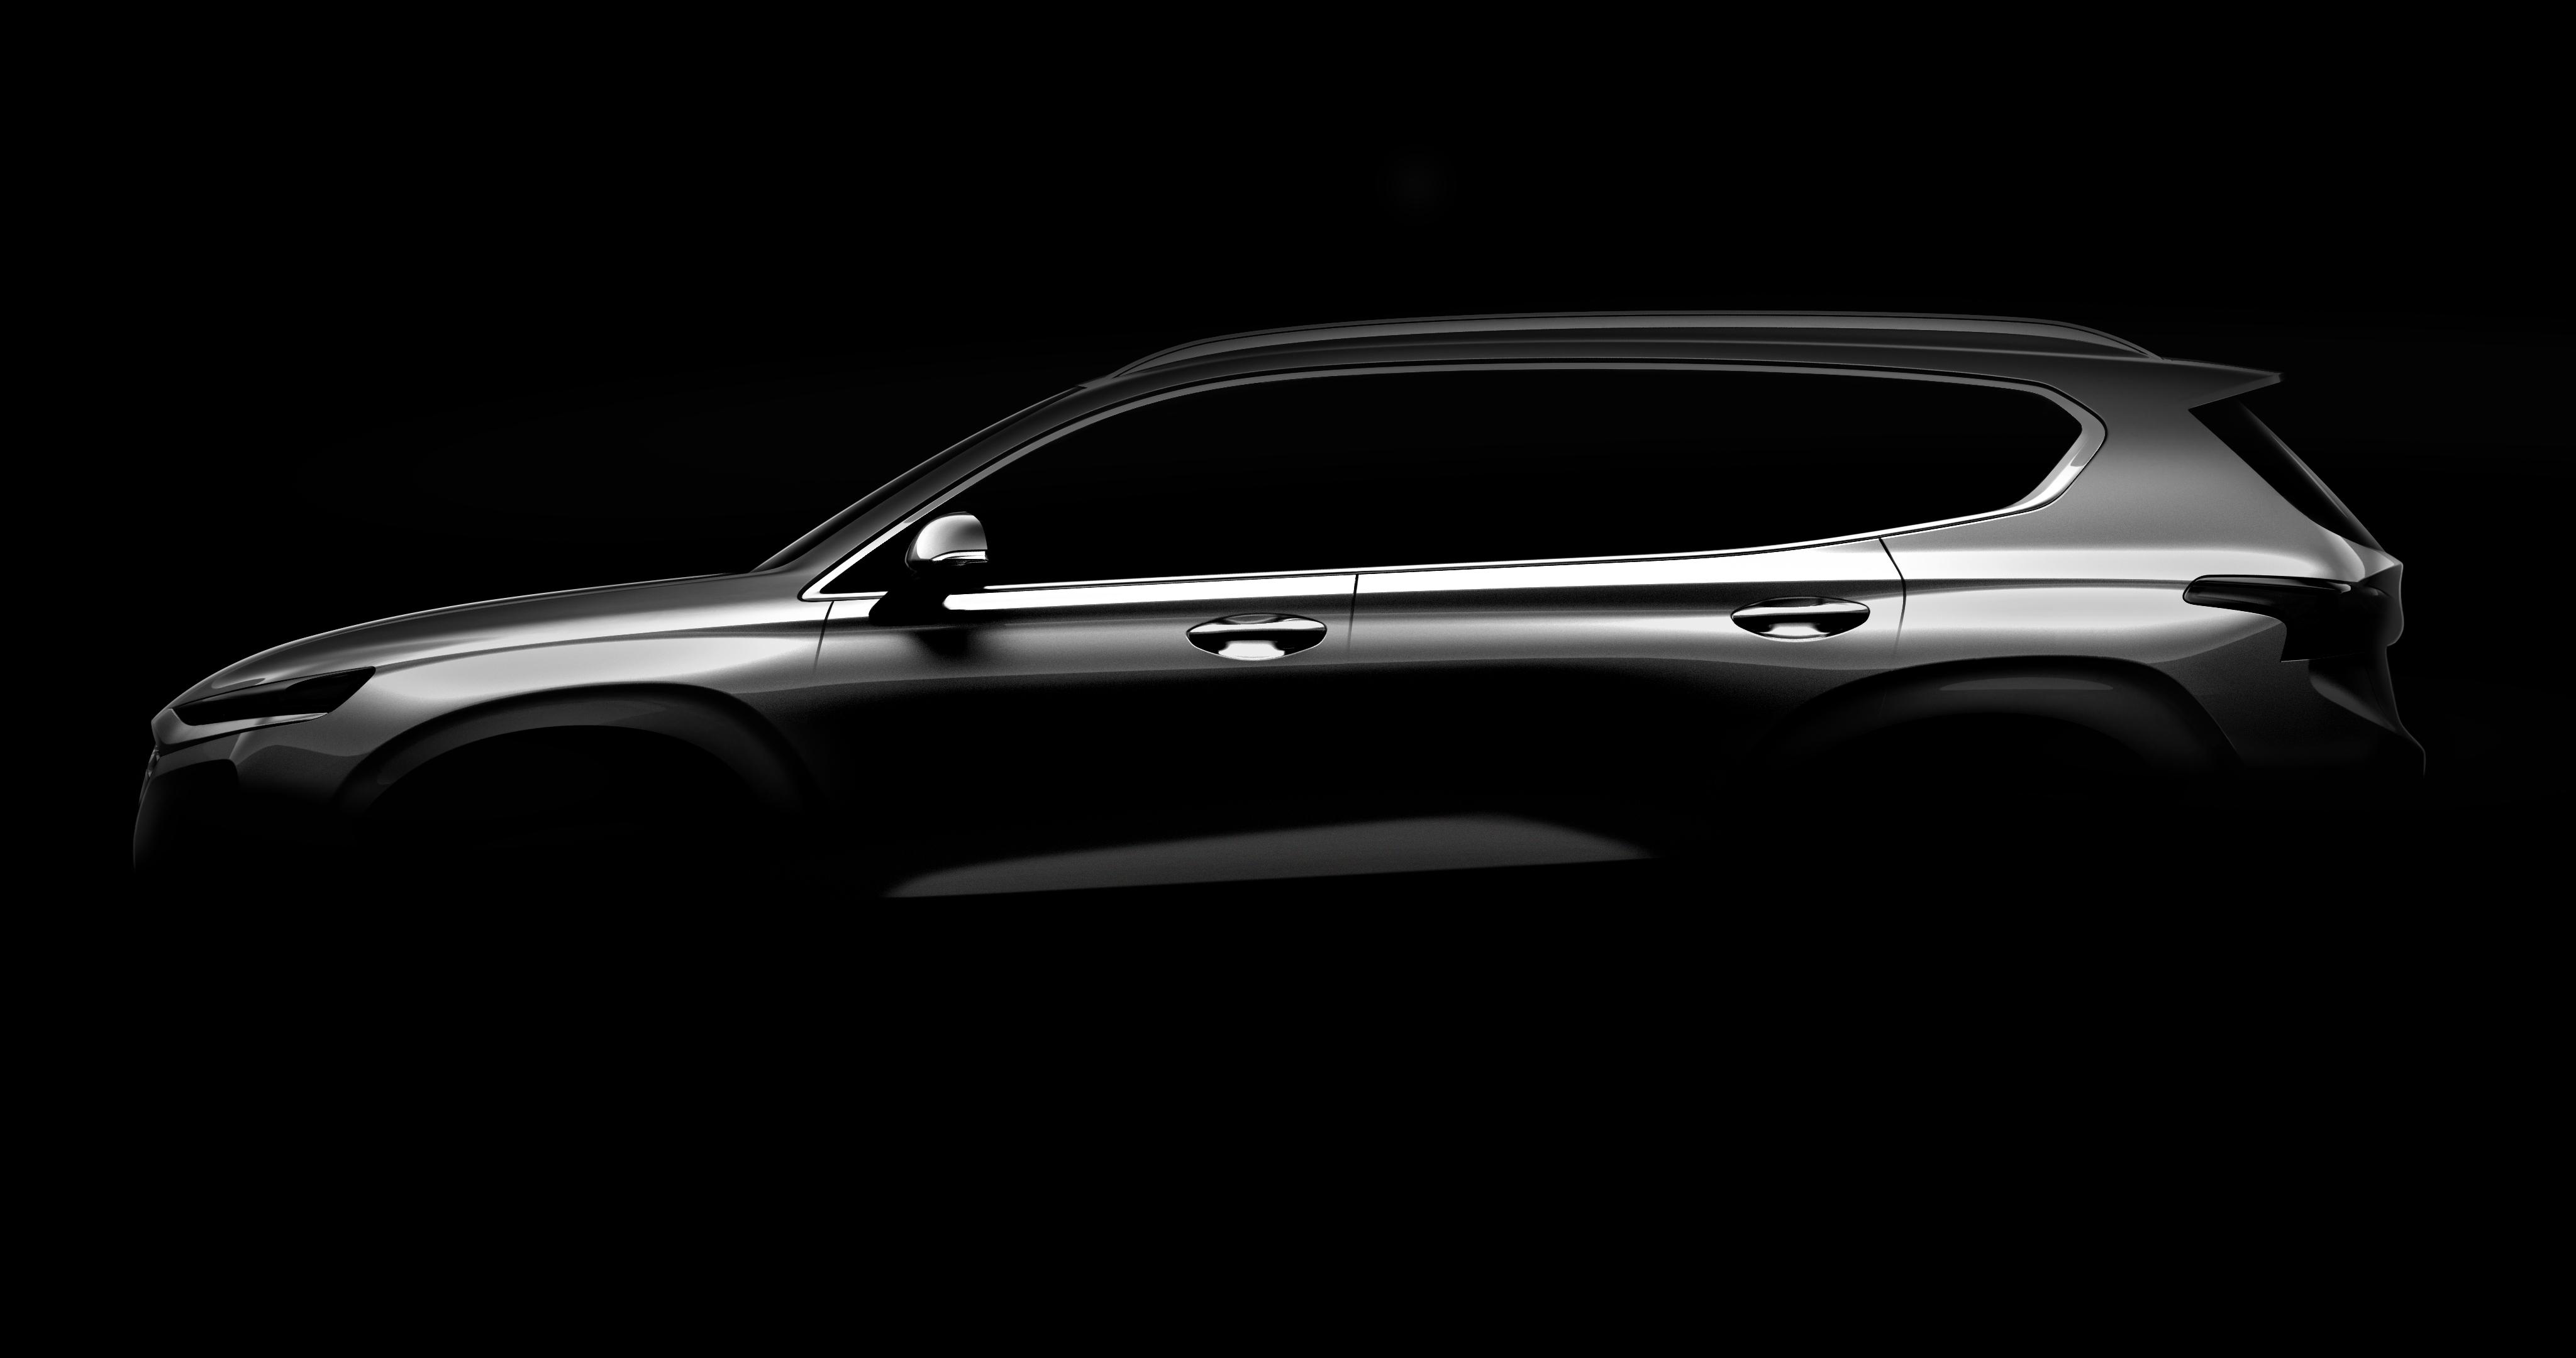 2018 Hyundai Santa Fe preview